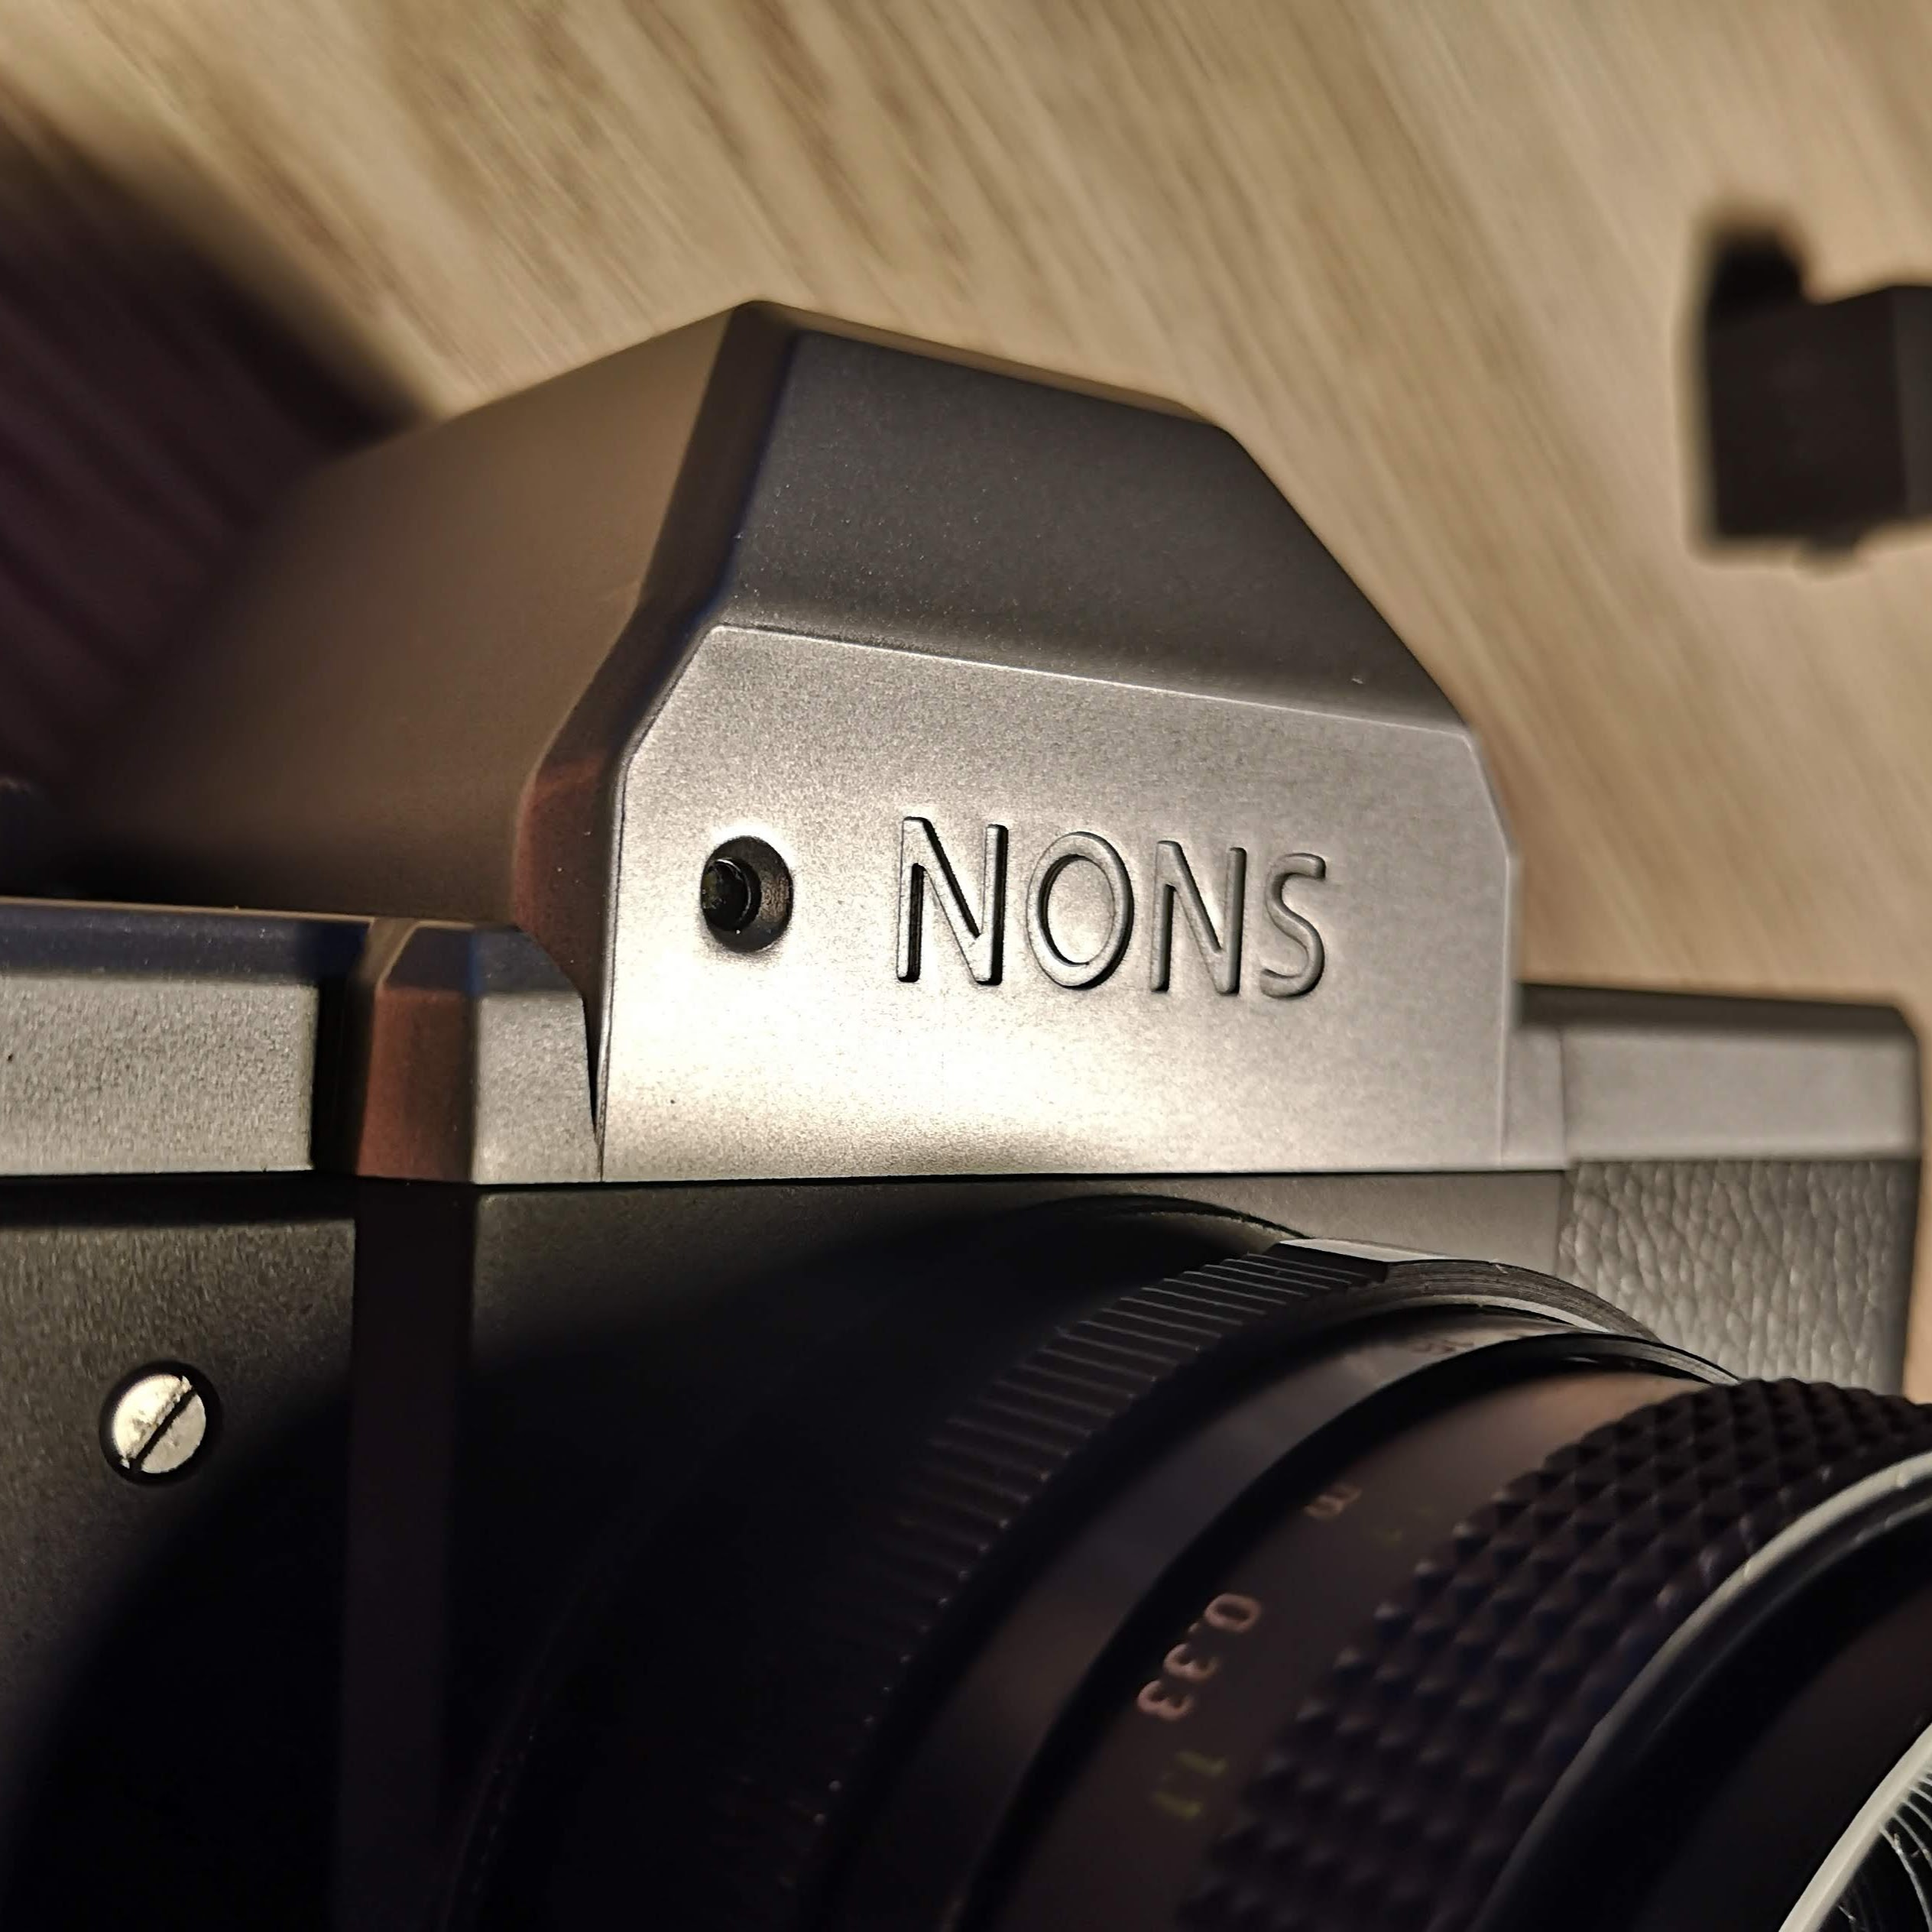 Nons SL42 Mark II Pentaprism Hump. Note hole for light sensor beside name